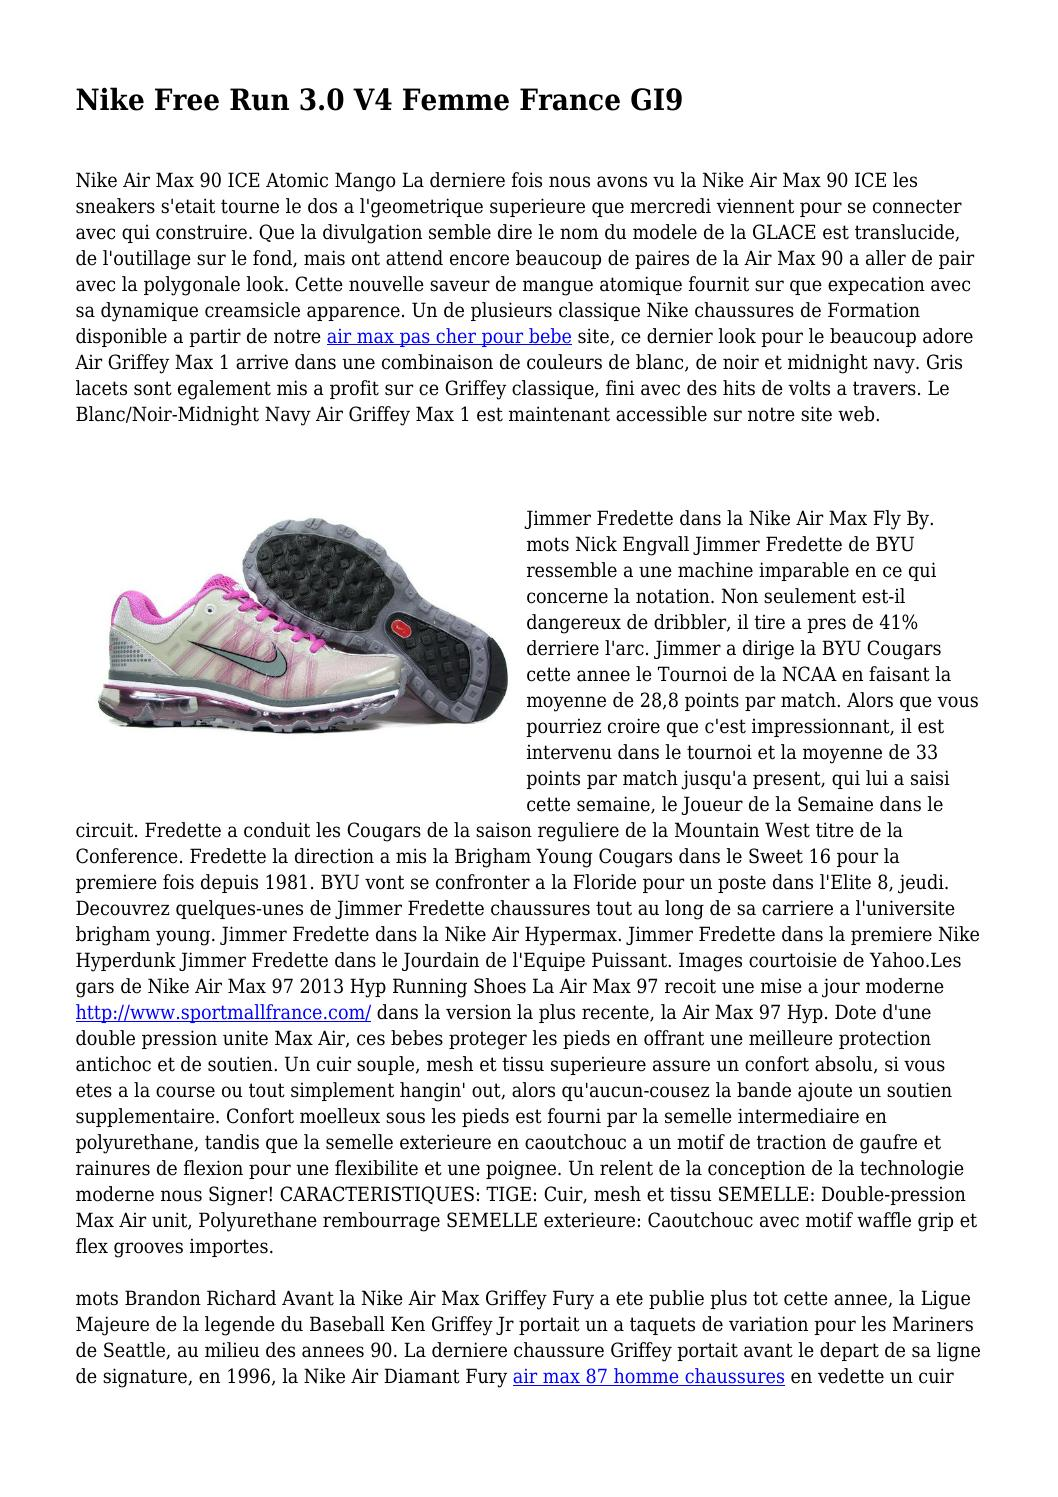 Nike air max 97 noir volt courtoisie